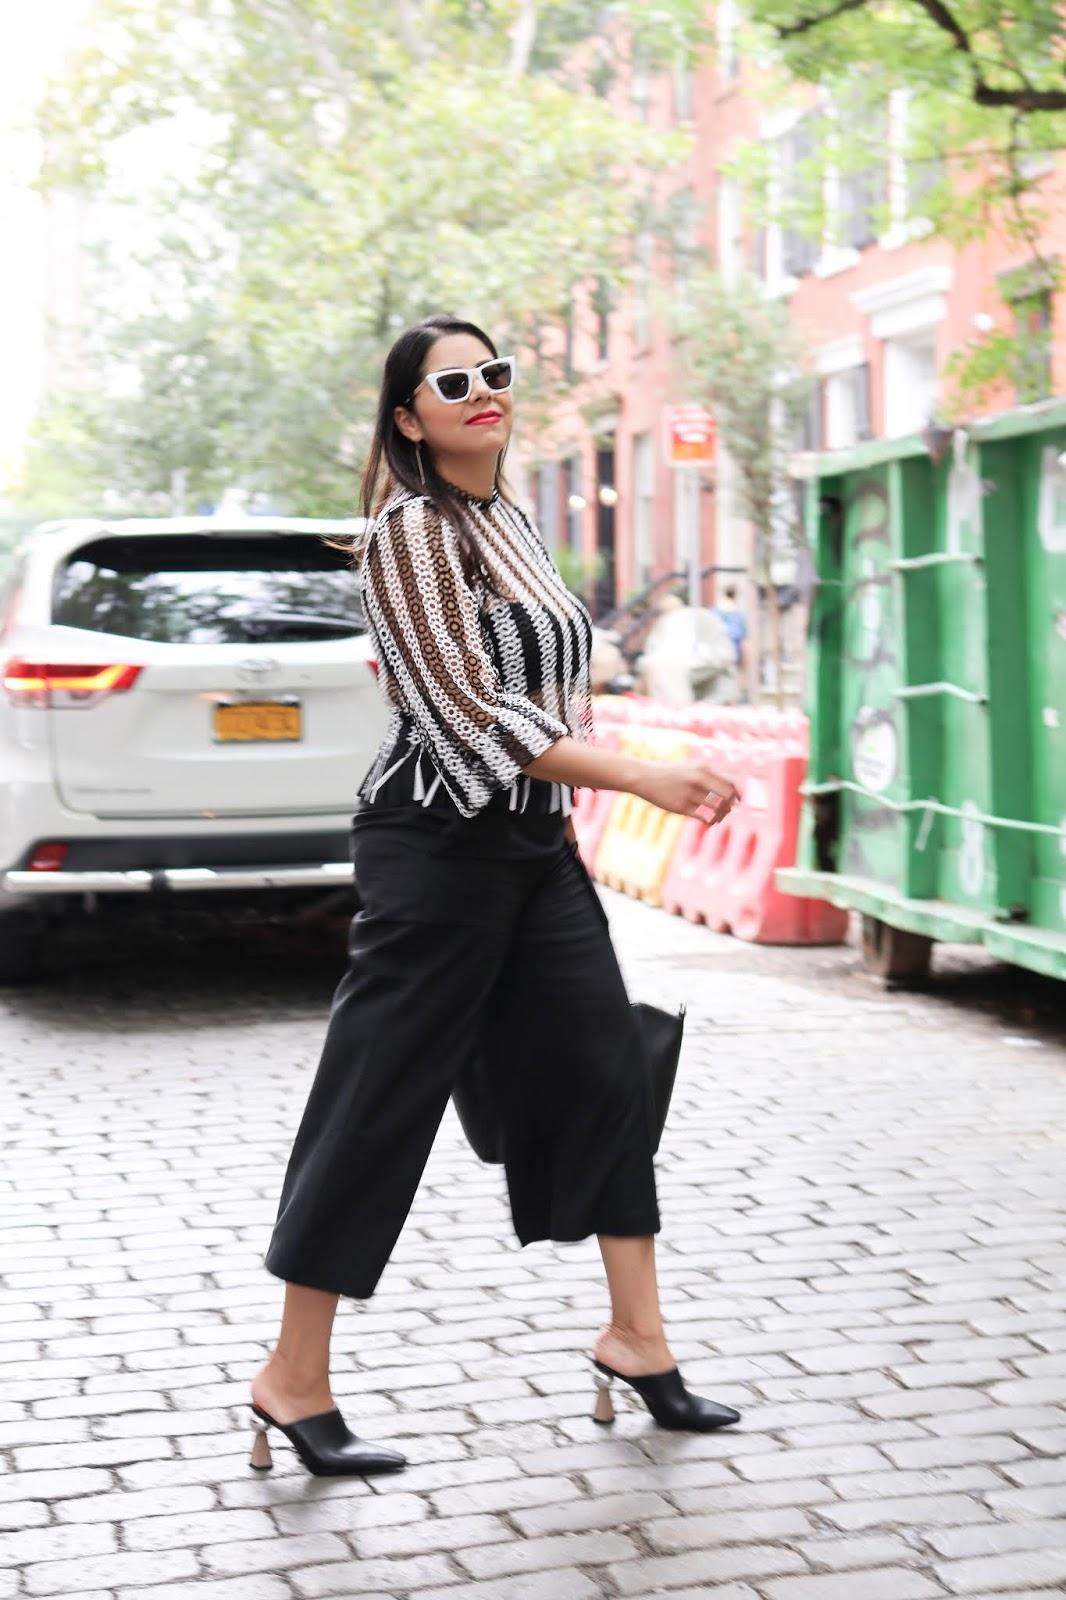 NYFW 2018 Street style, new york fashion week street style